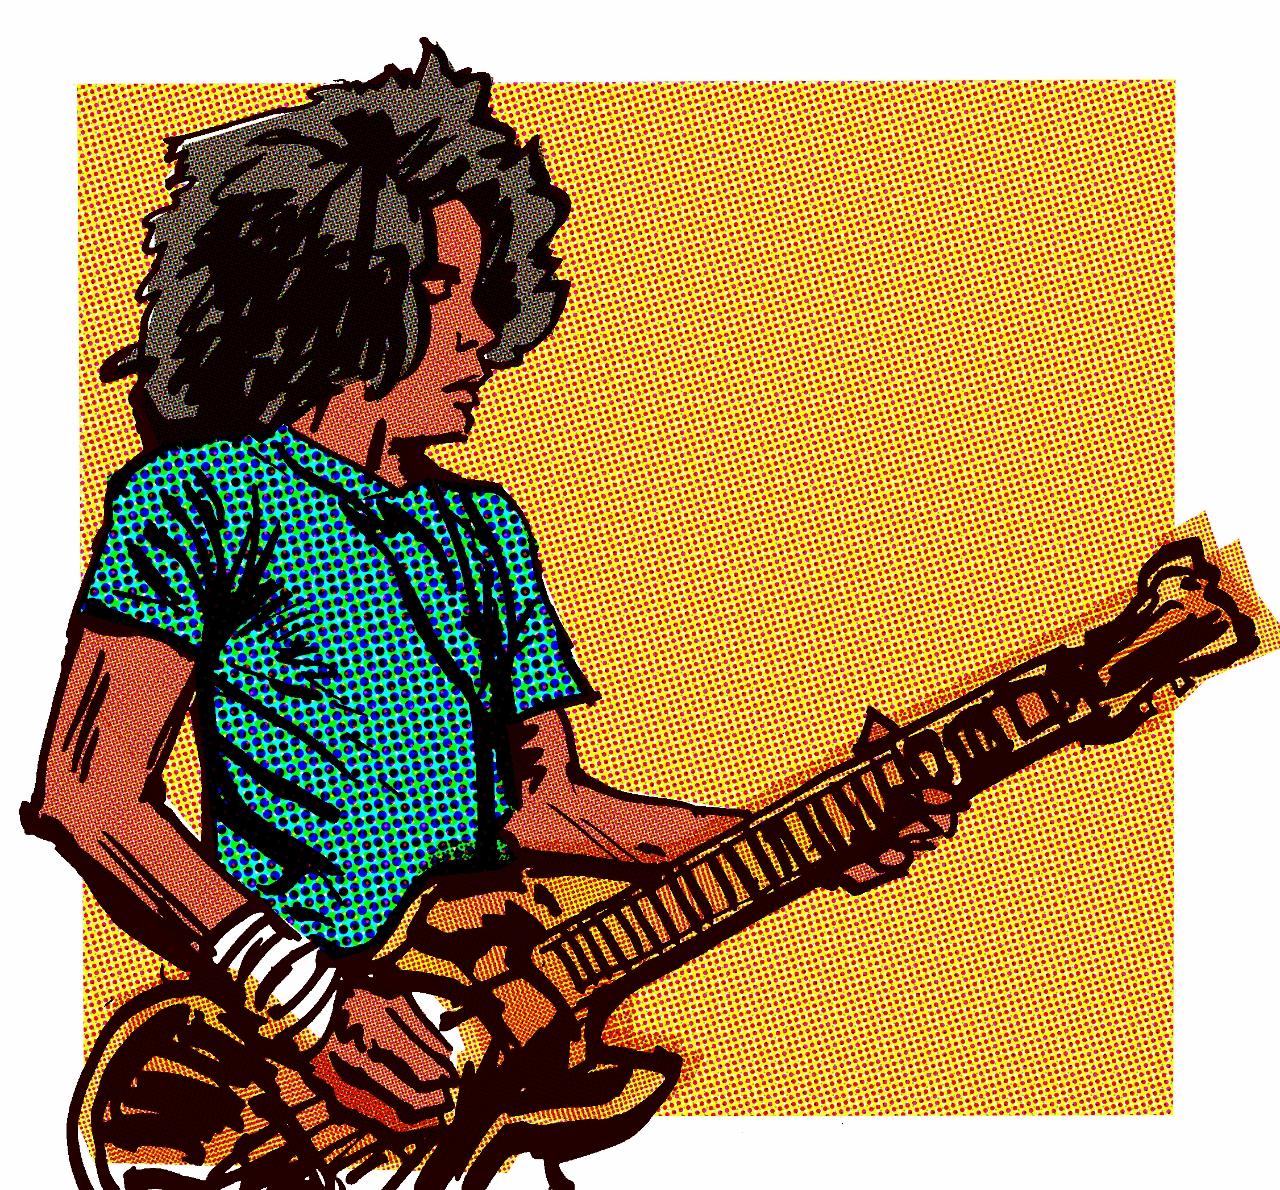 Brandon Bailey Johnson illustration by Oisin McGillion Hughes